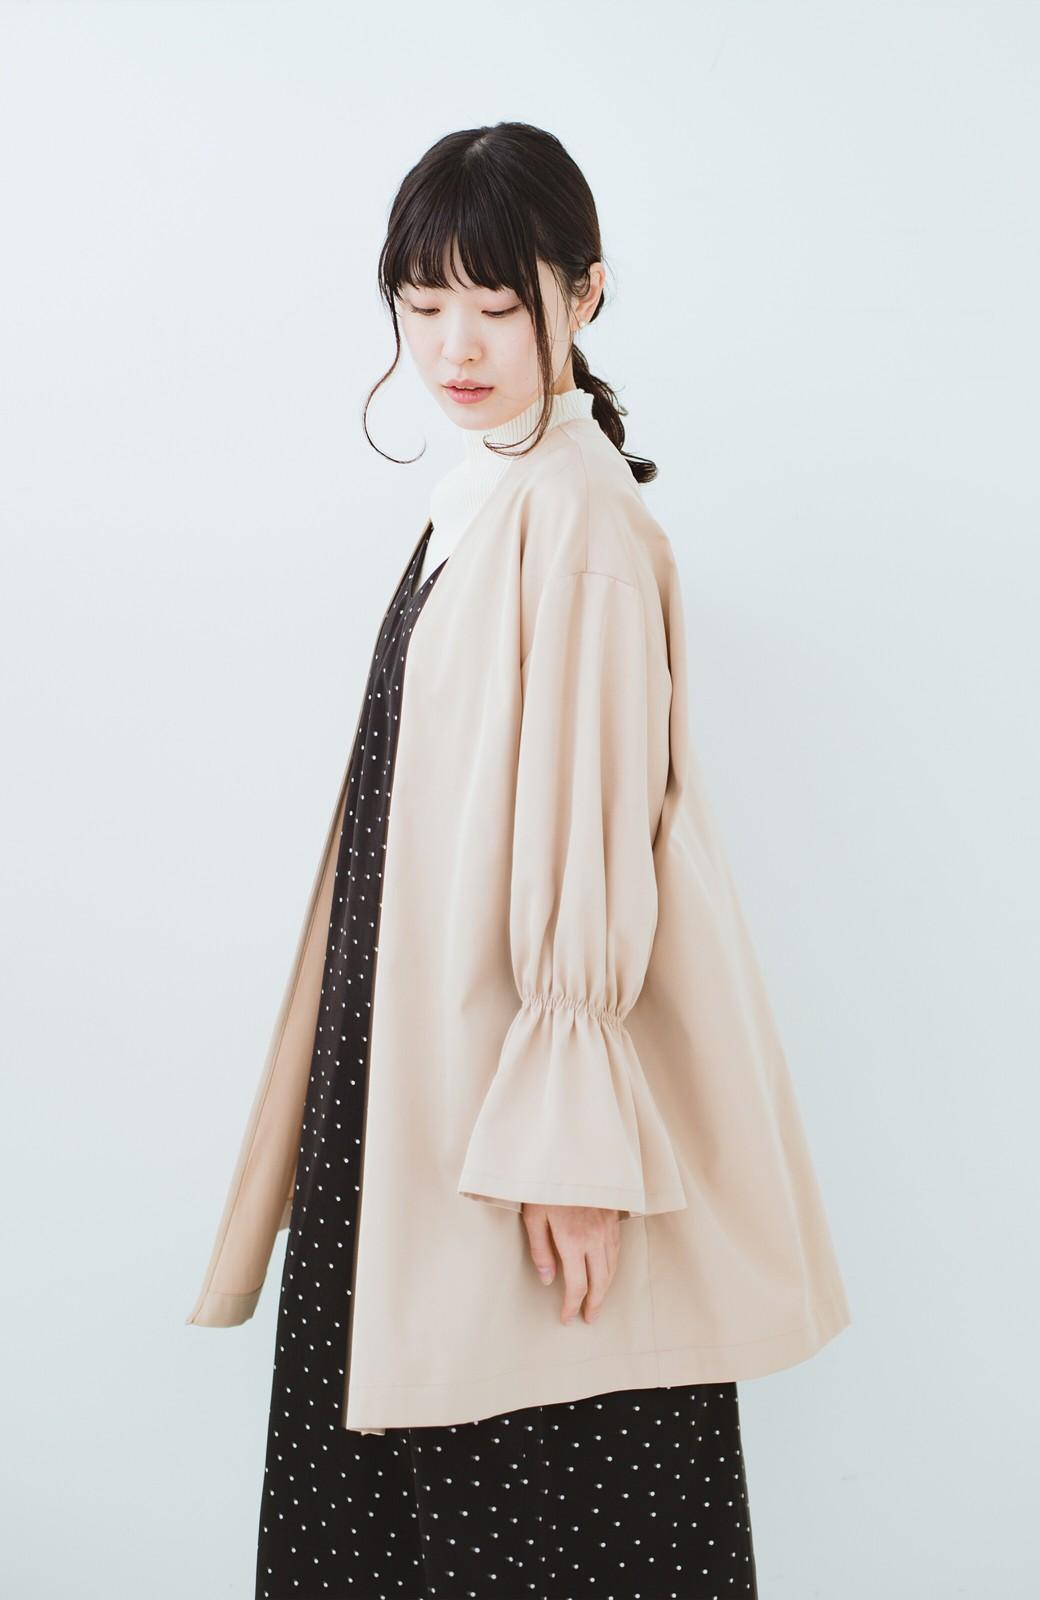 haco! ただ羽織るだけでオシャレに見える 気軽なフレアースリーブコート <ベージュ>の商品写真10